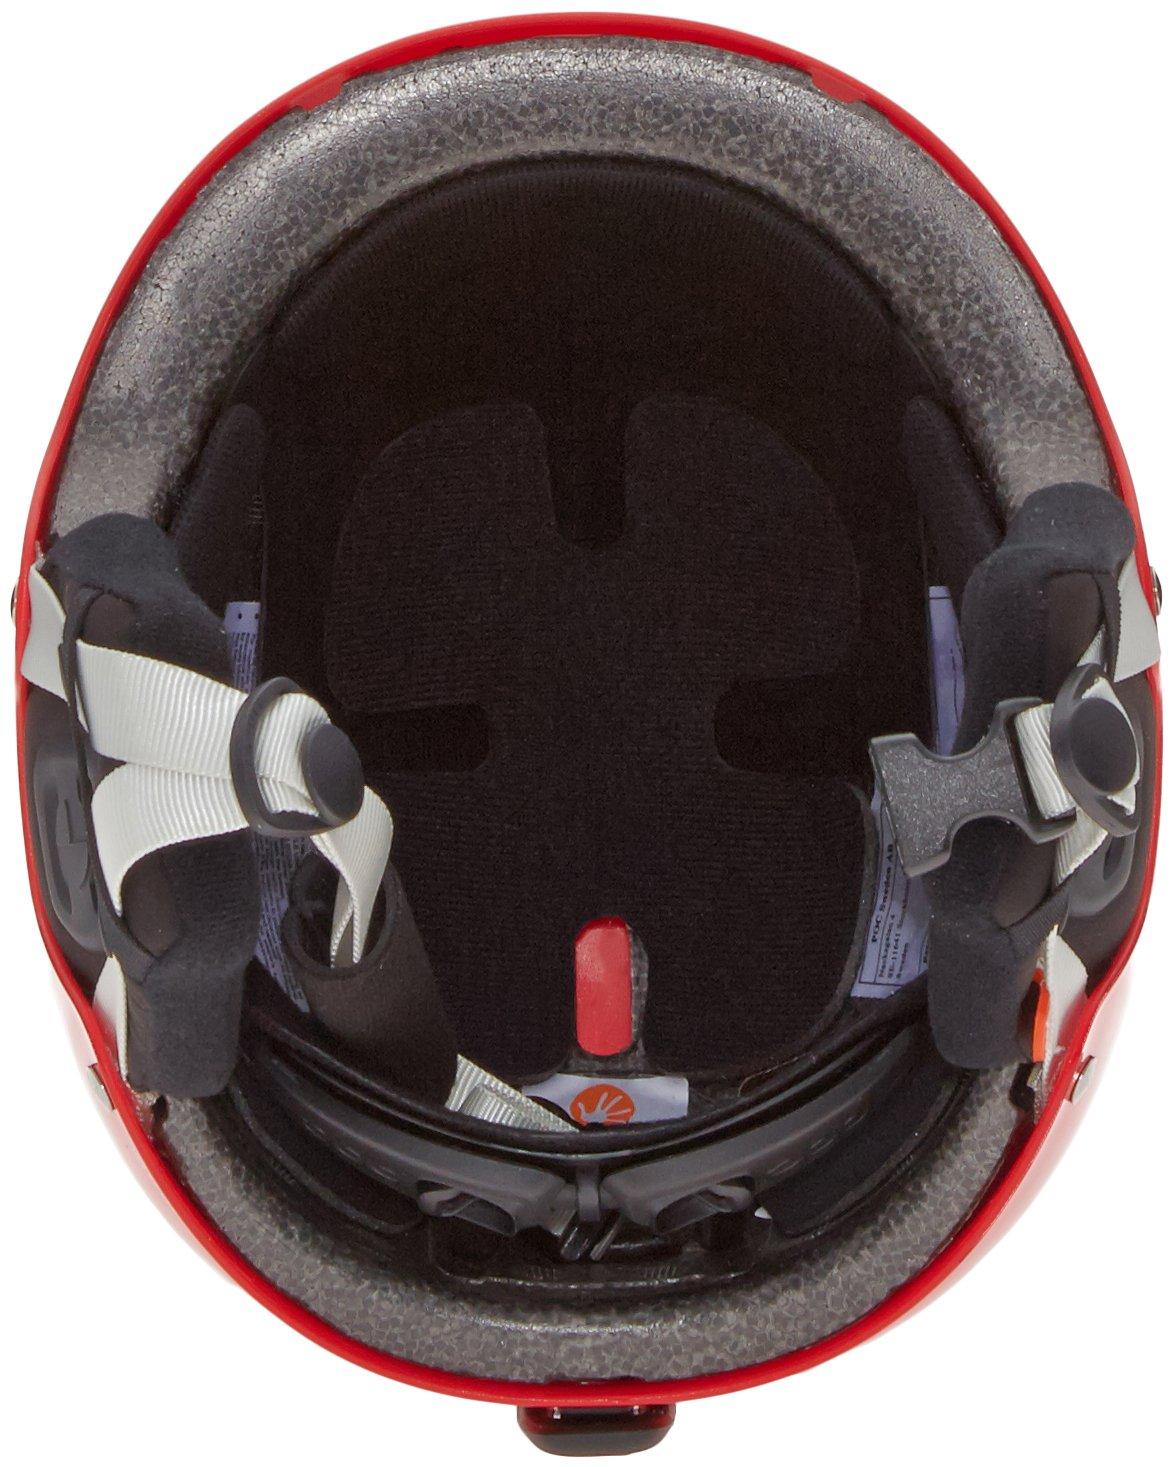 POC Skihelm Receptor Bug B00CKHUT16 Skihelme Abgabepreis Abgabepreis Abgabepreis 9496b6